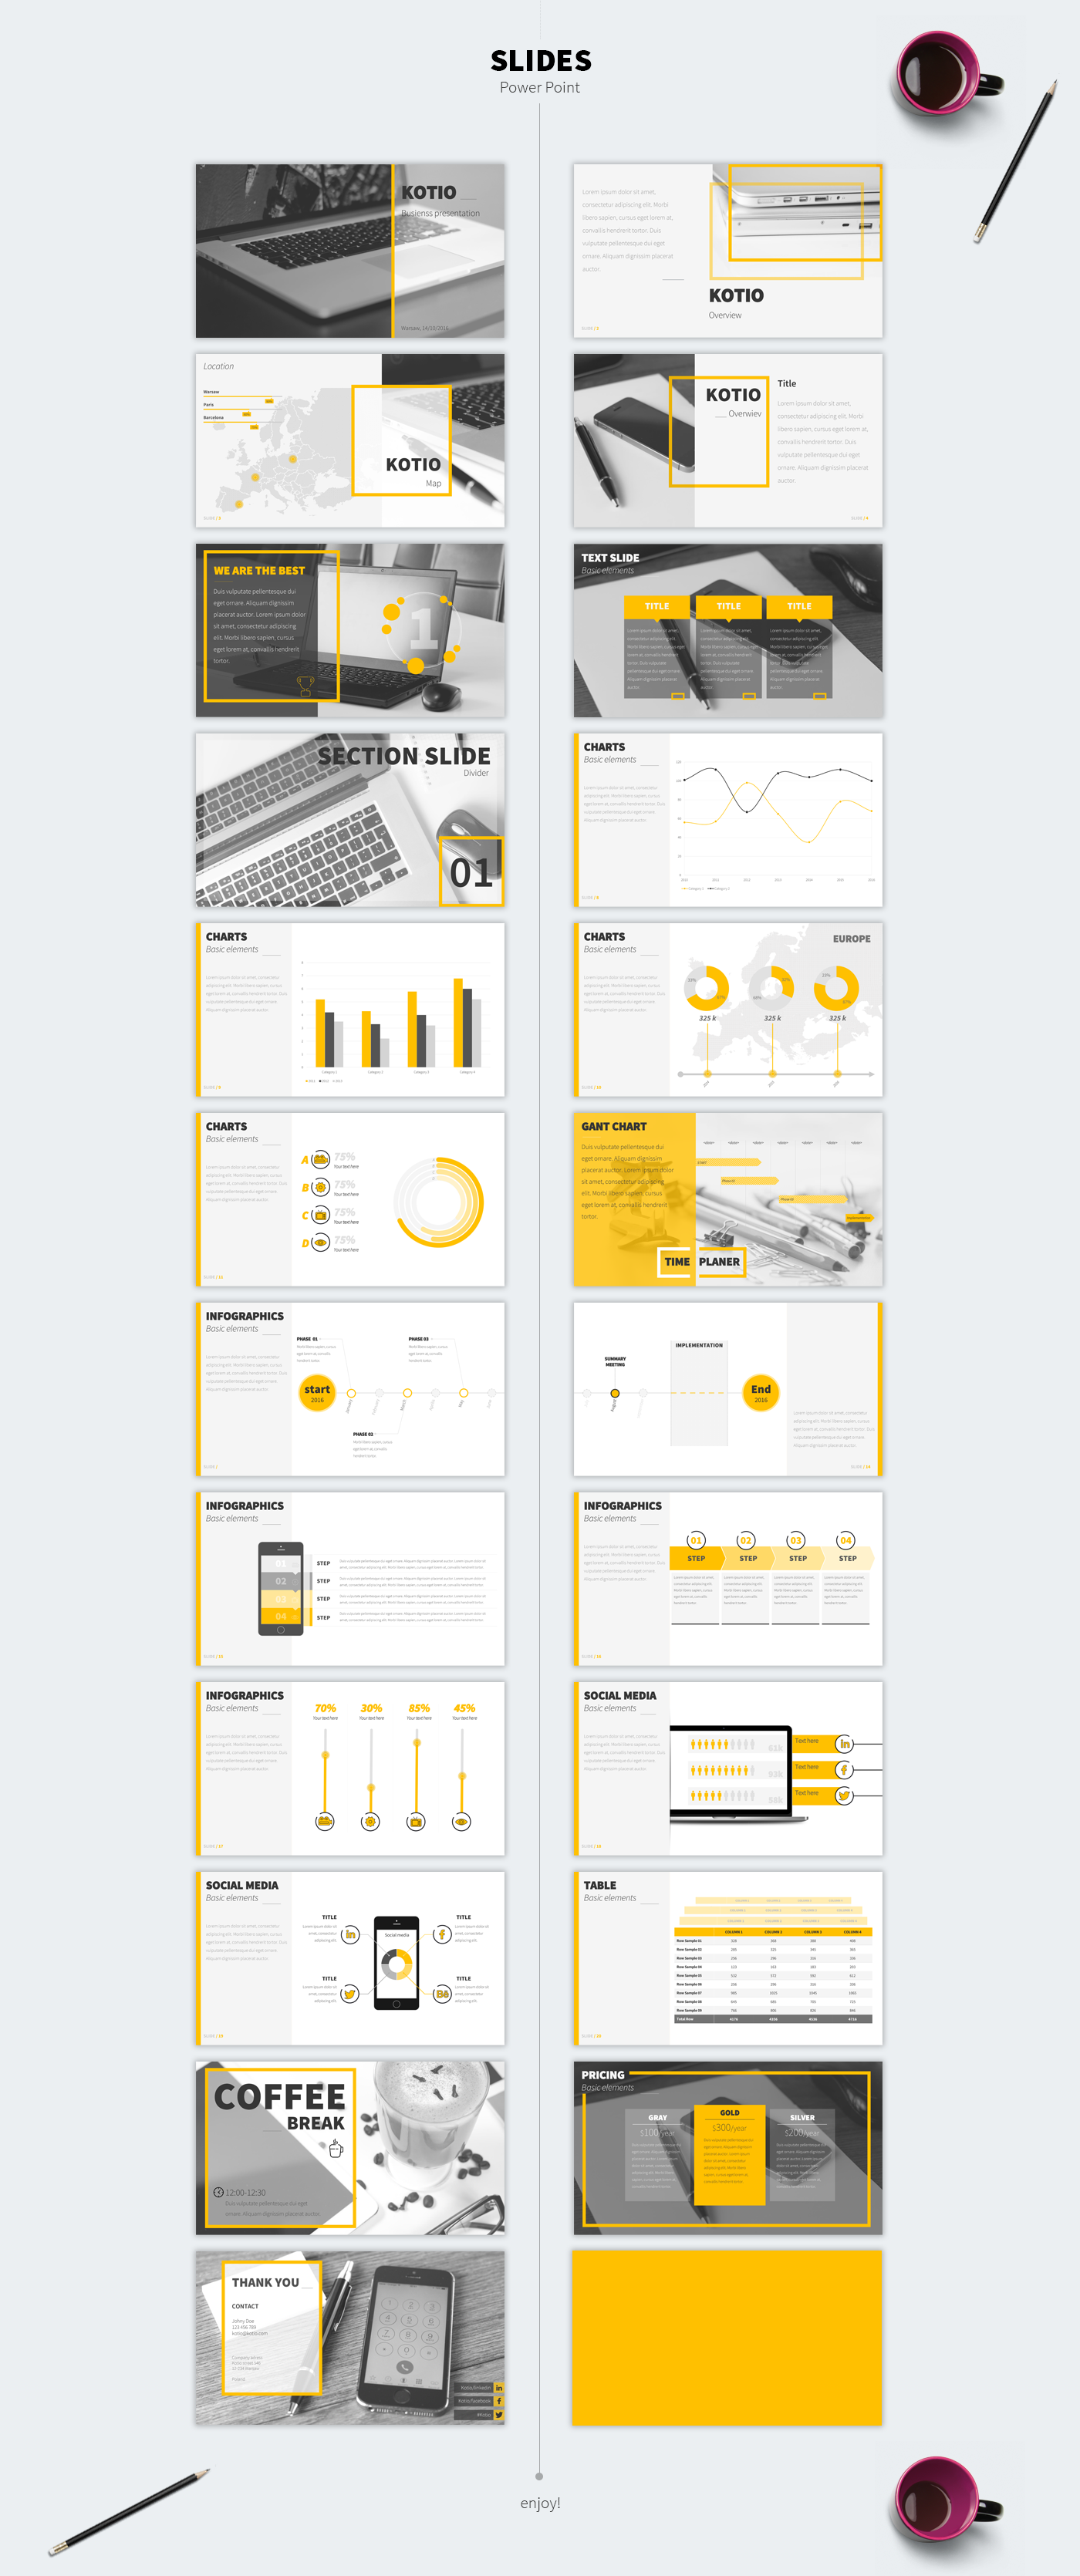 Kotio free Power Point Business Presentation - Kotio free Power Point Business Presentation - Yellow, creative, Business